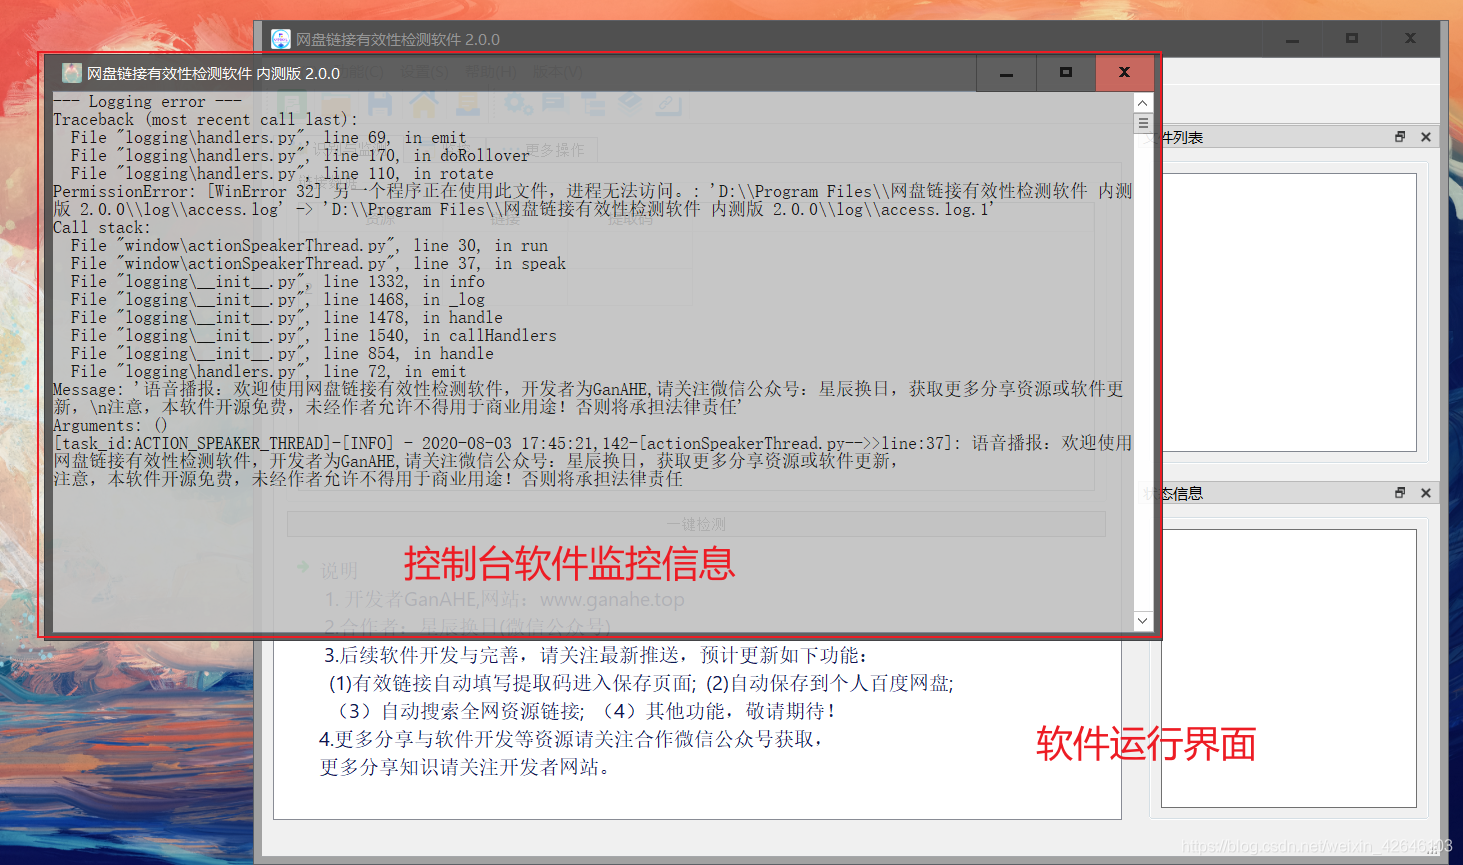 Uploading file...